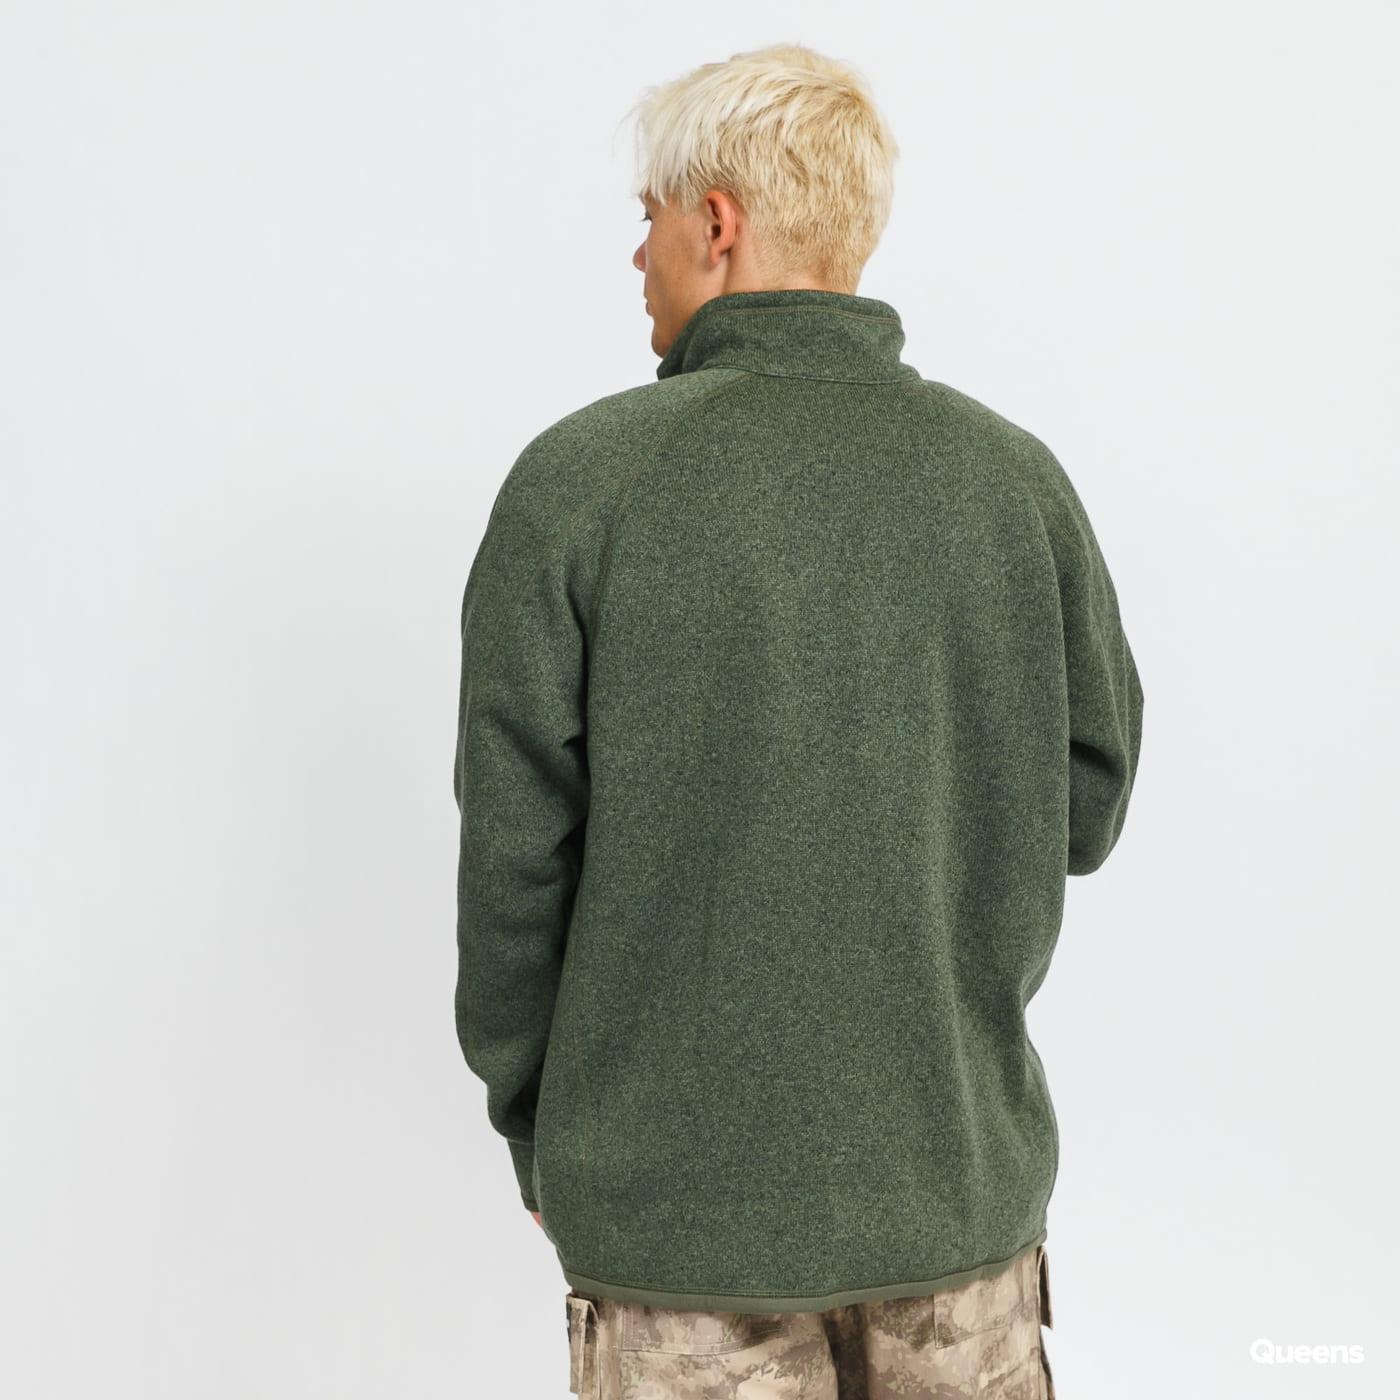 Patagonia M's Better Sweater 1/4 Zip melange tmavě zelený